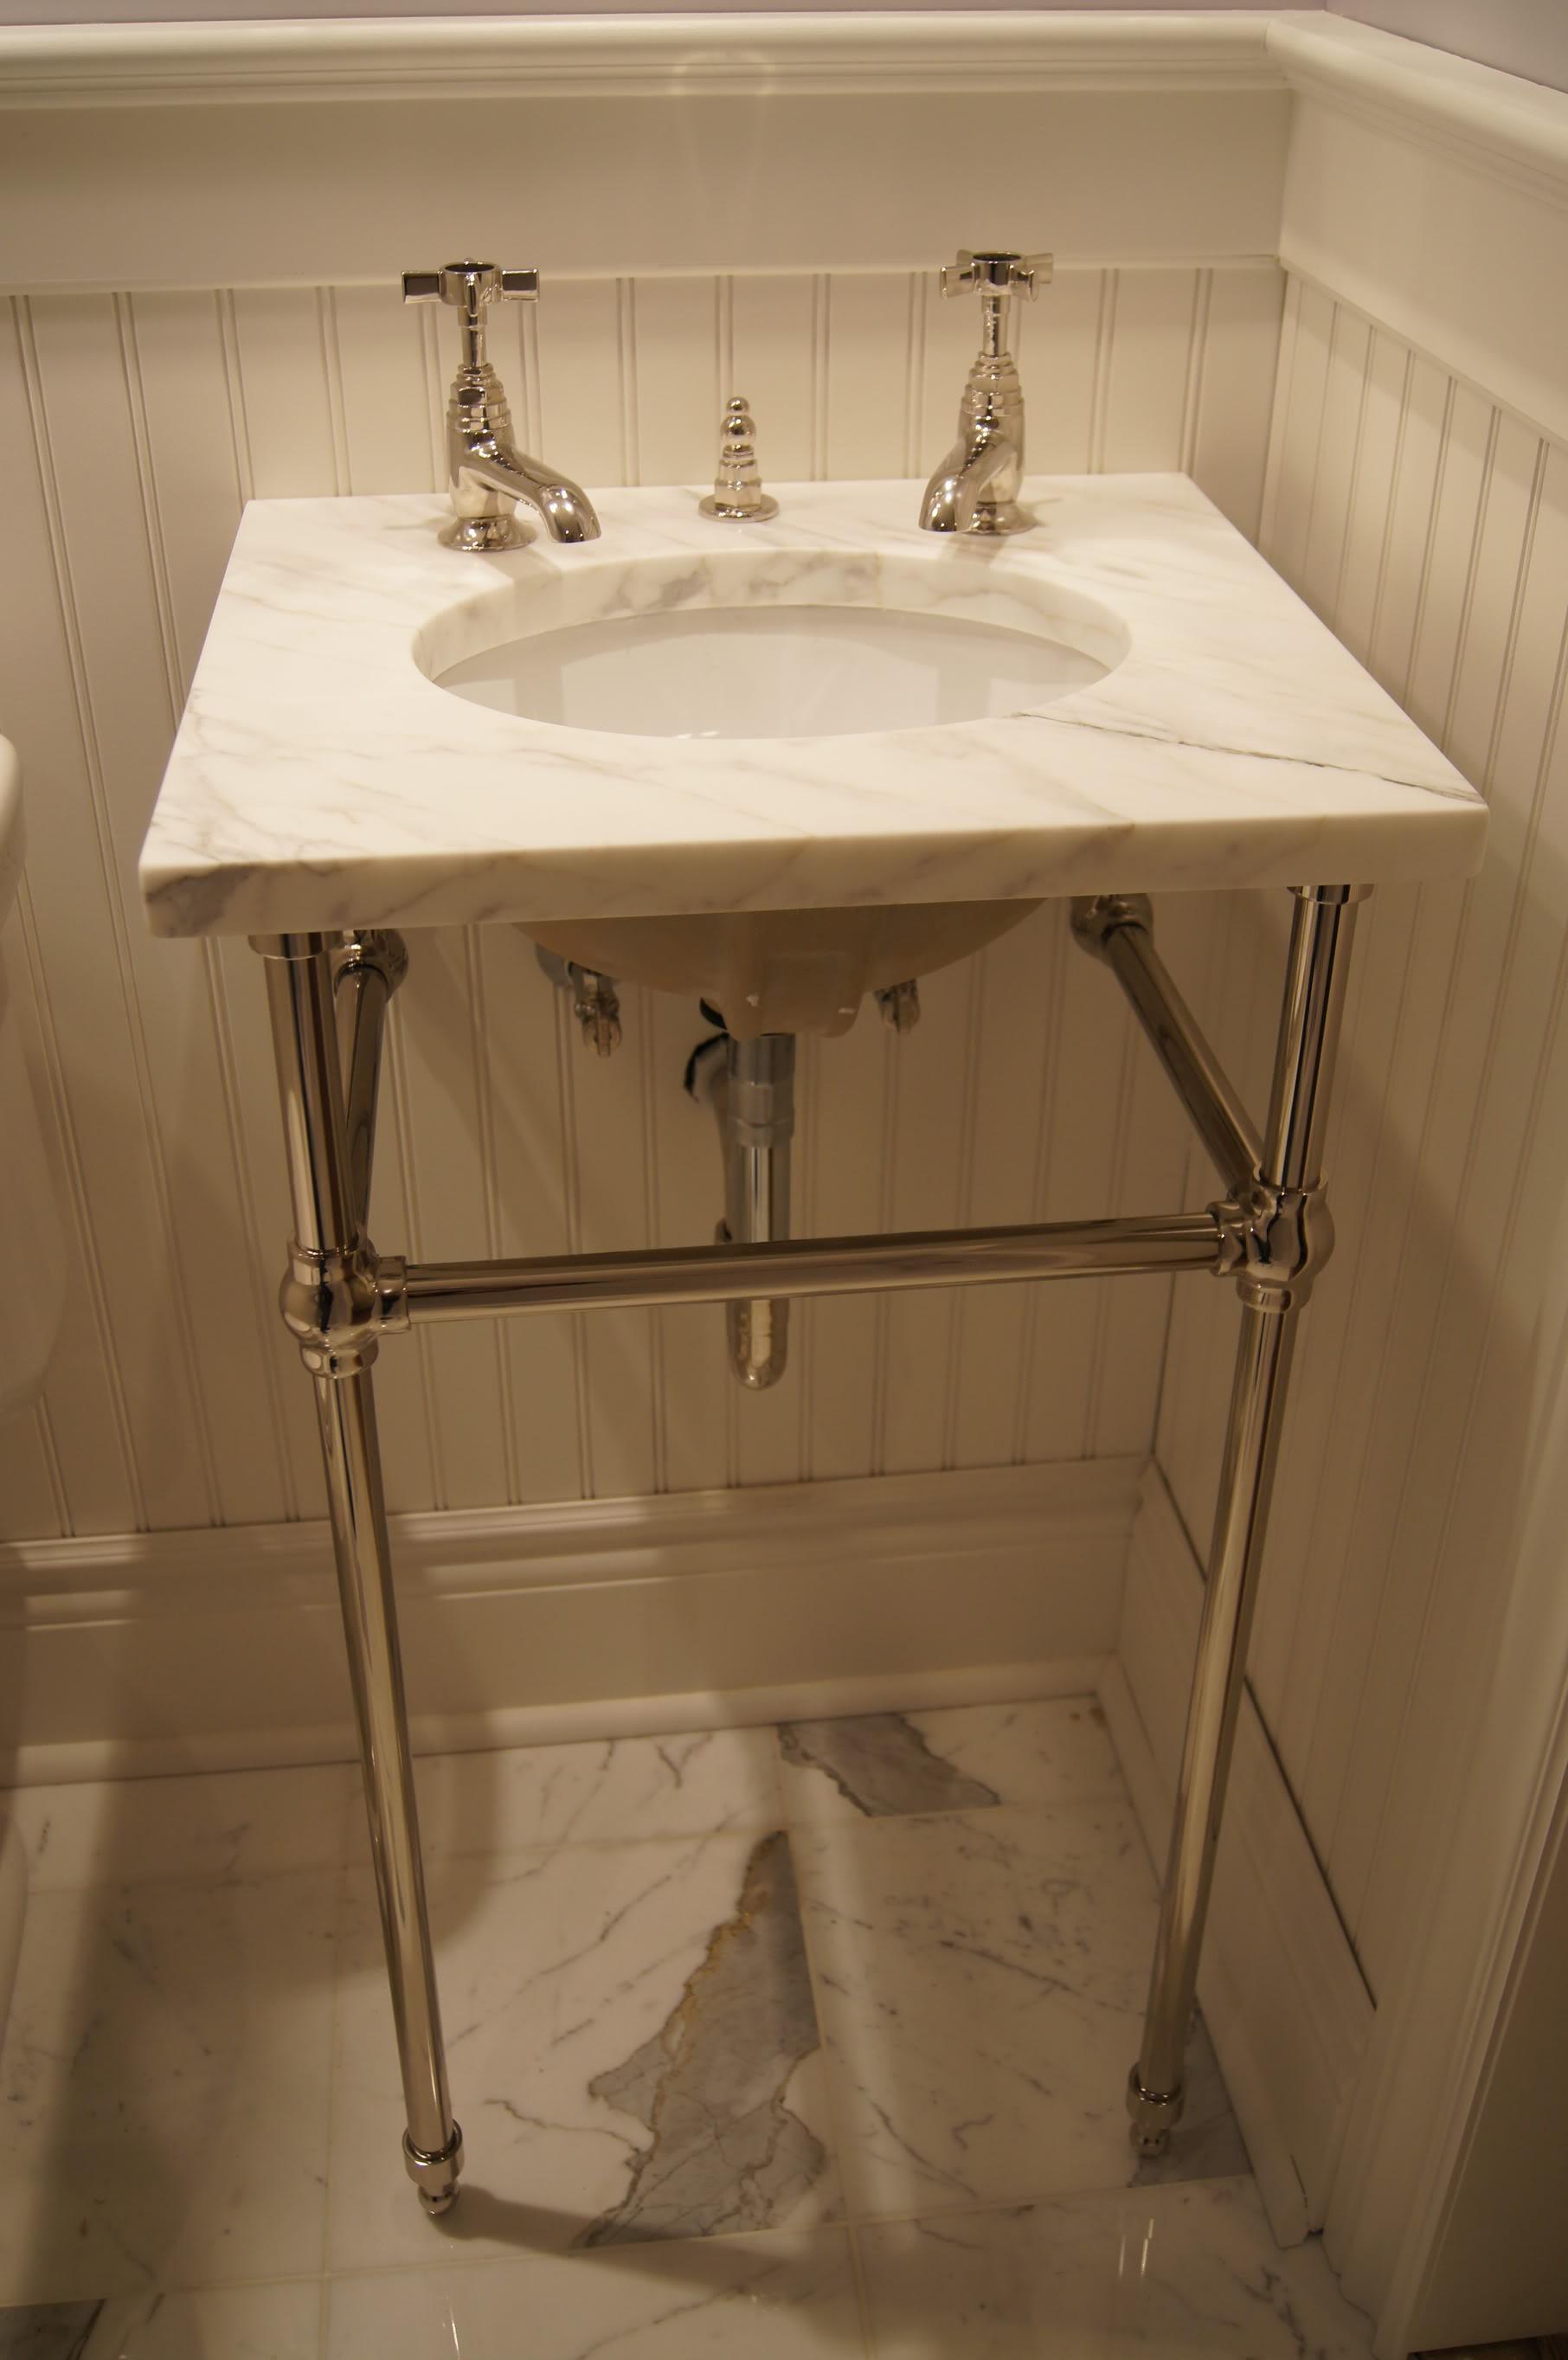 Fresh Console Sinks For Small Bathrooms Gallery Bathroom Design